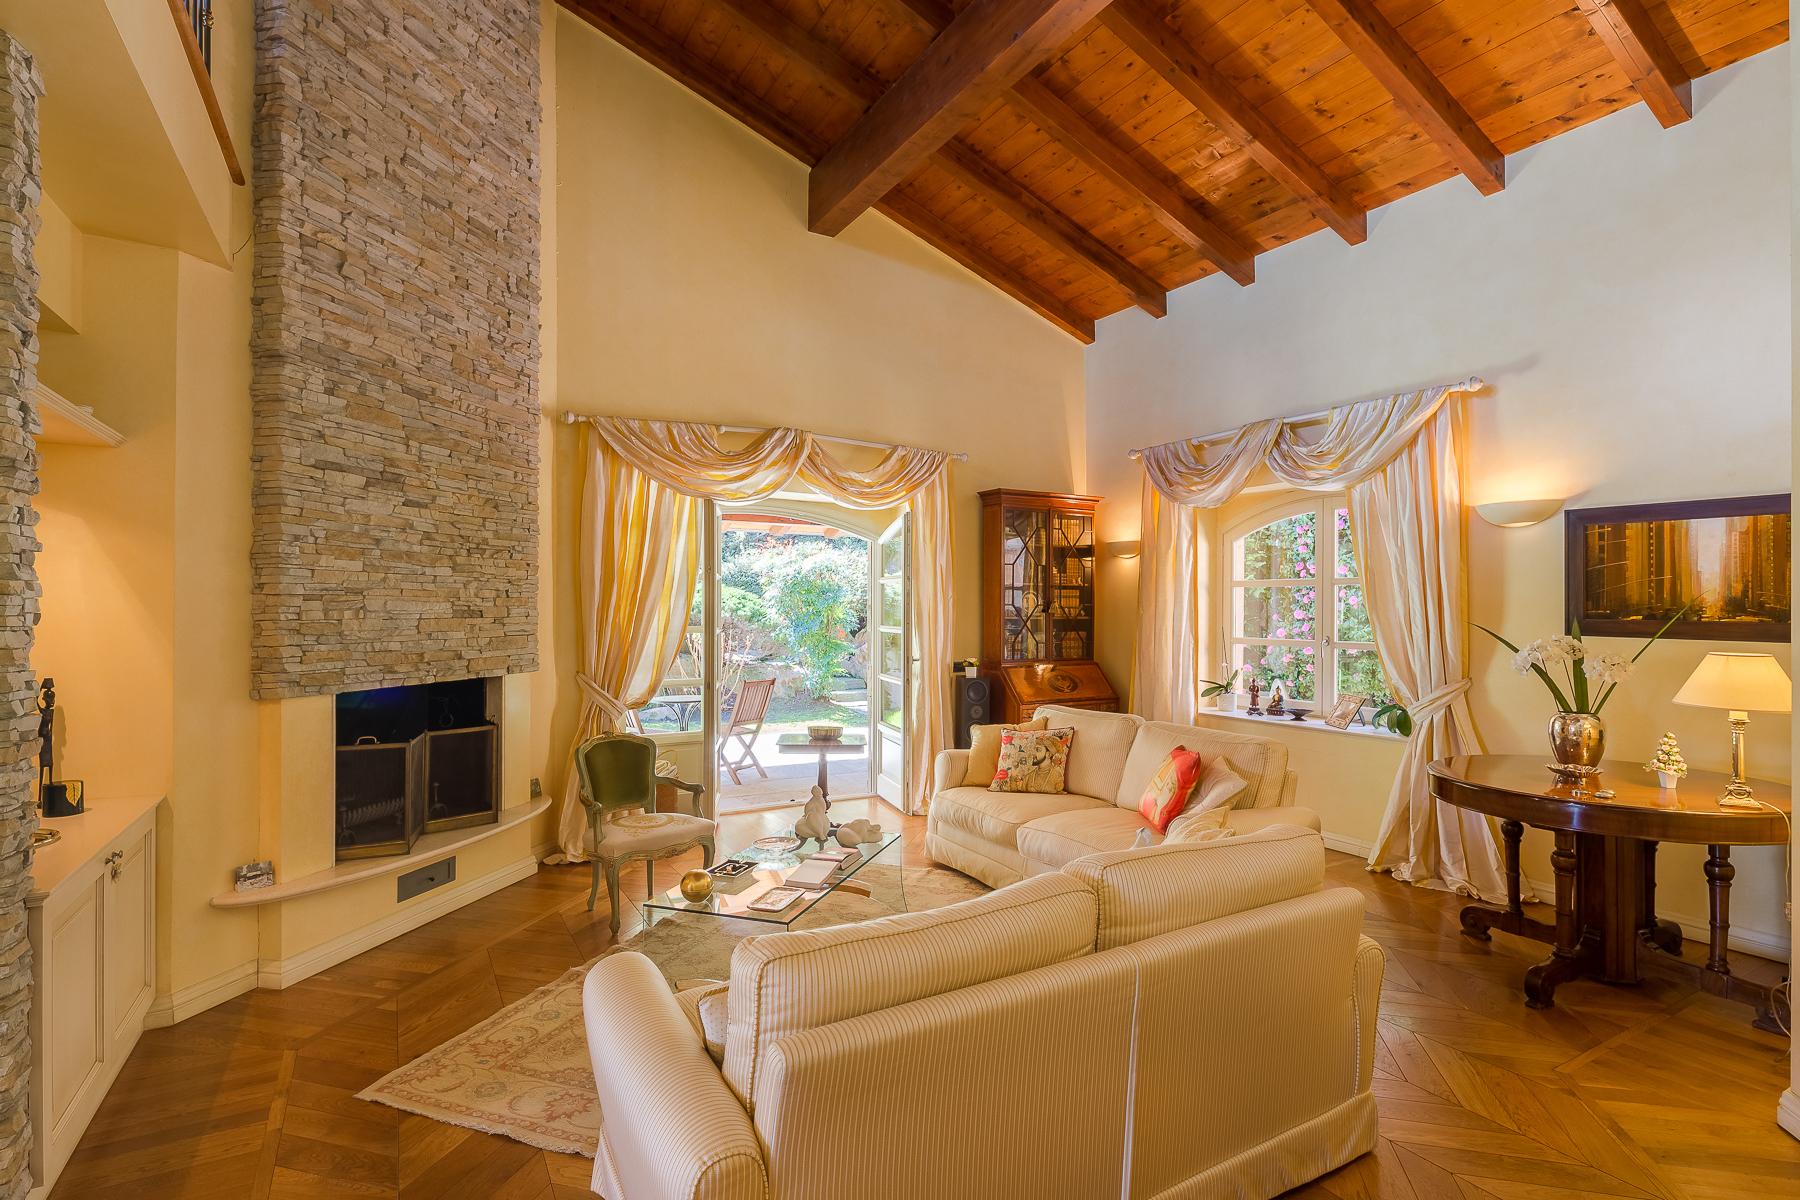 Villa in Vendita a Varese: 5 locali, 470 mq - Foto 10